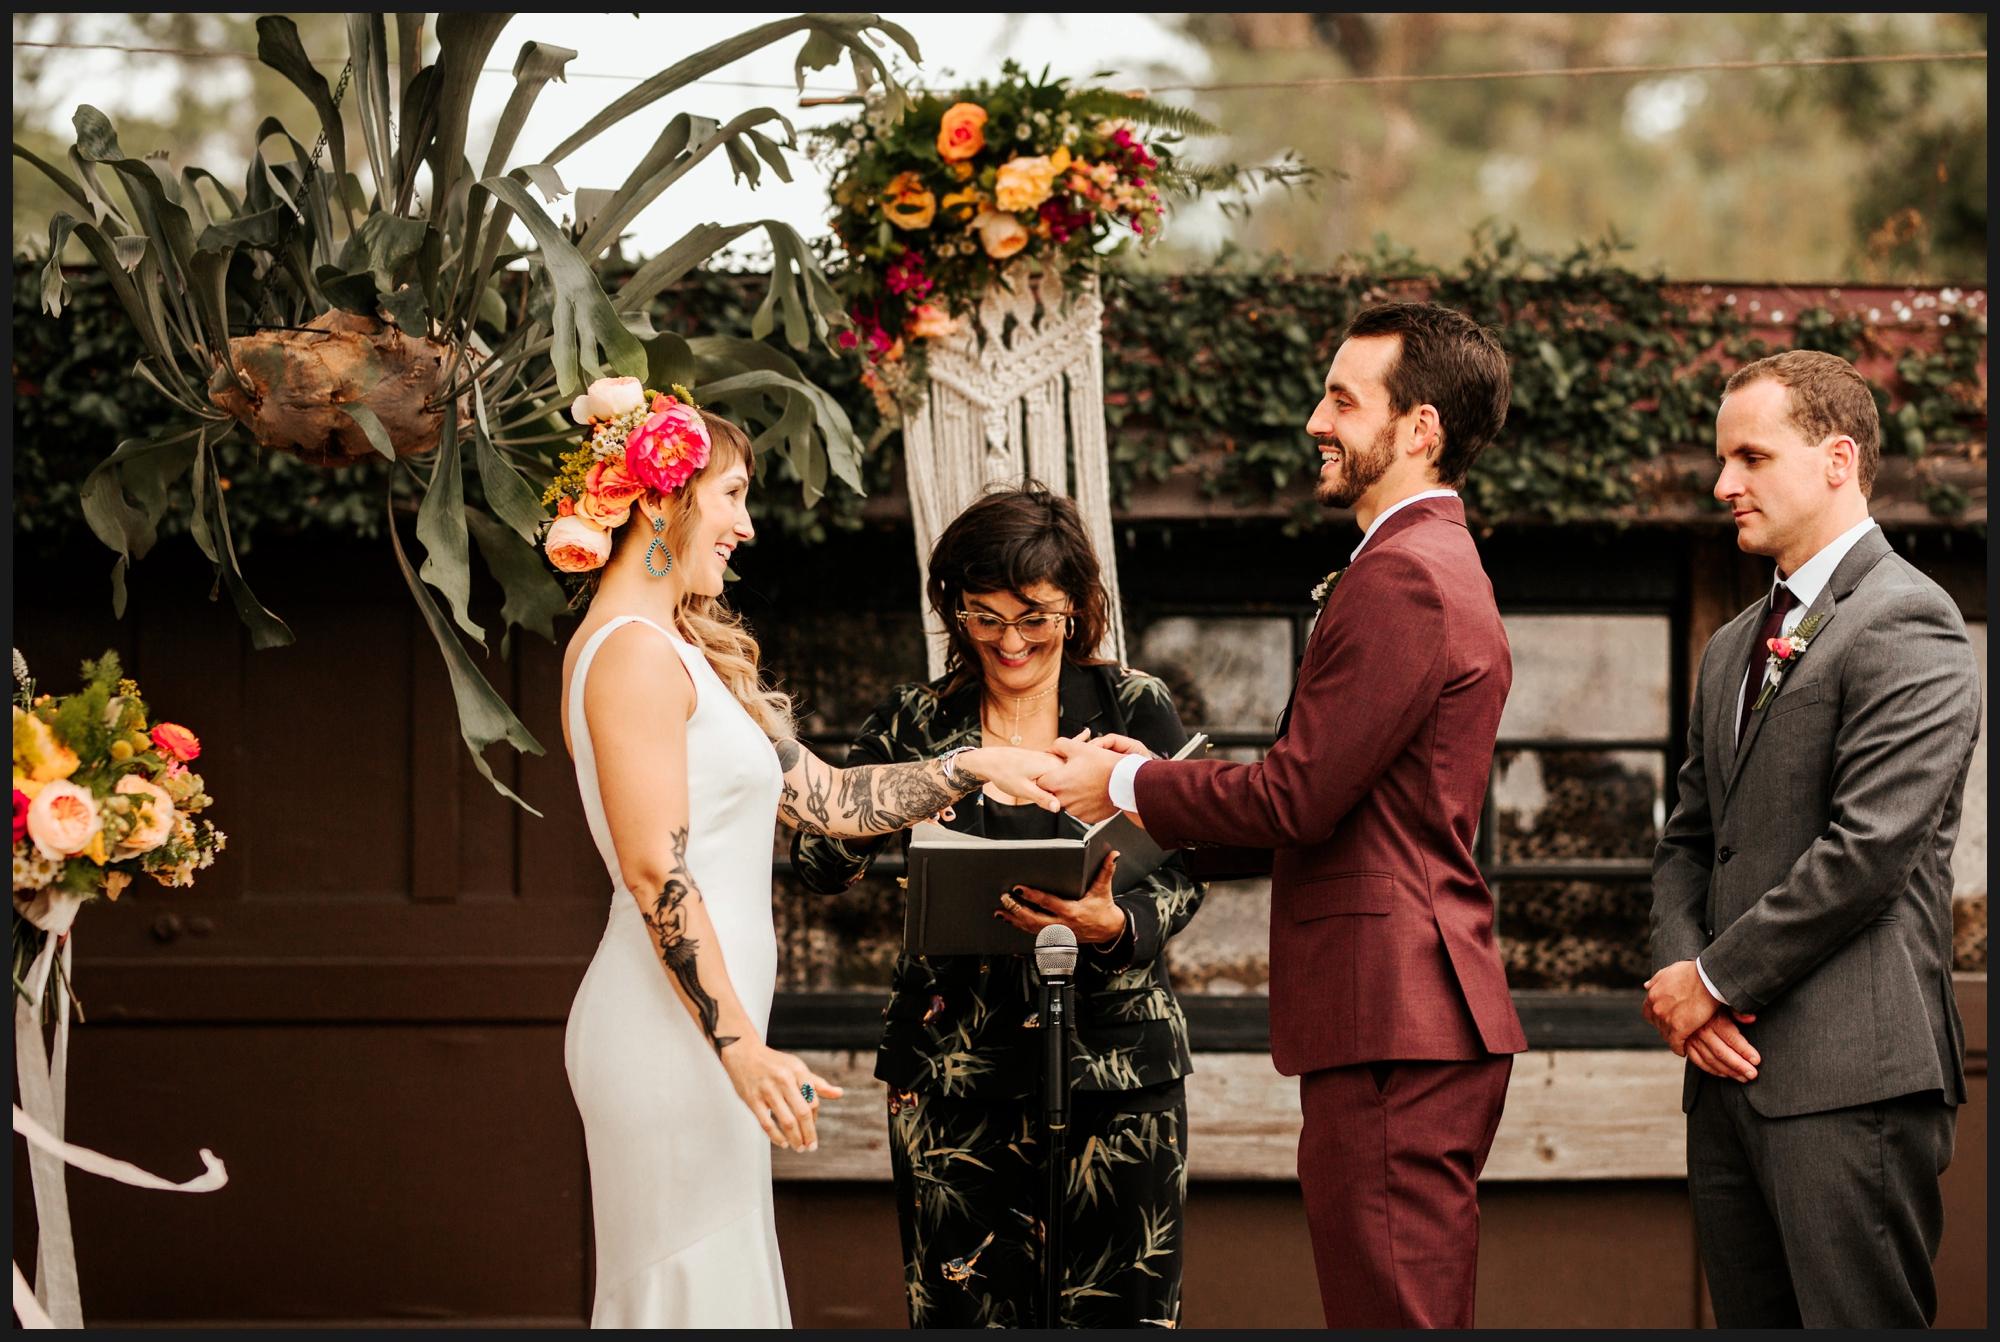 Orlando-Wedding-Photographer-destination-wedding-photographer-florida-wedding-photographer-bohemian-wedding-photographer_2009.jpg